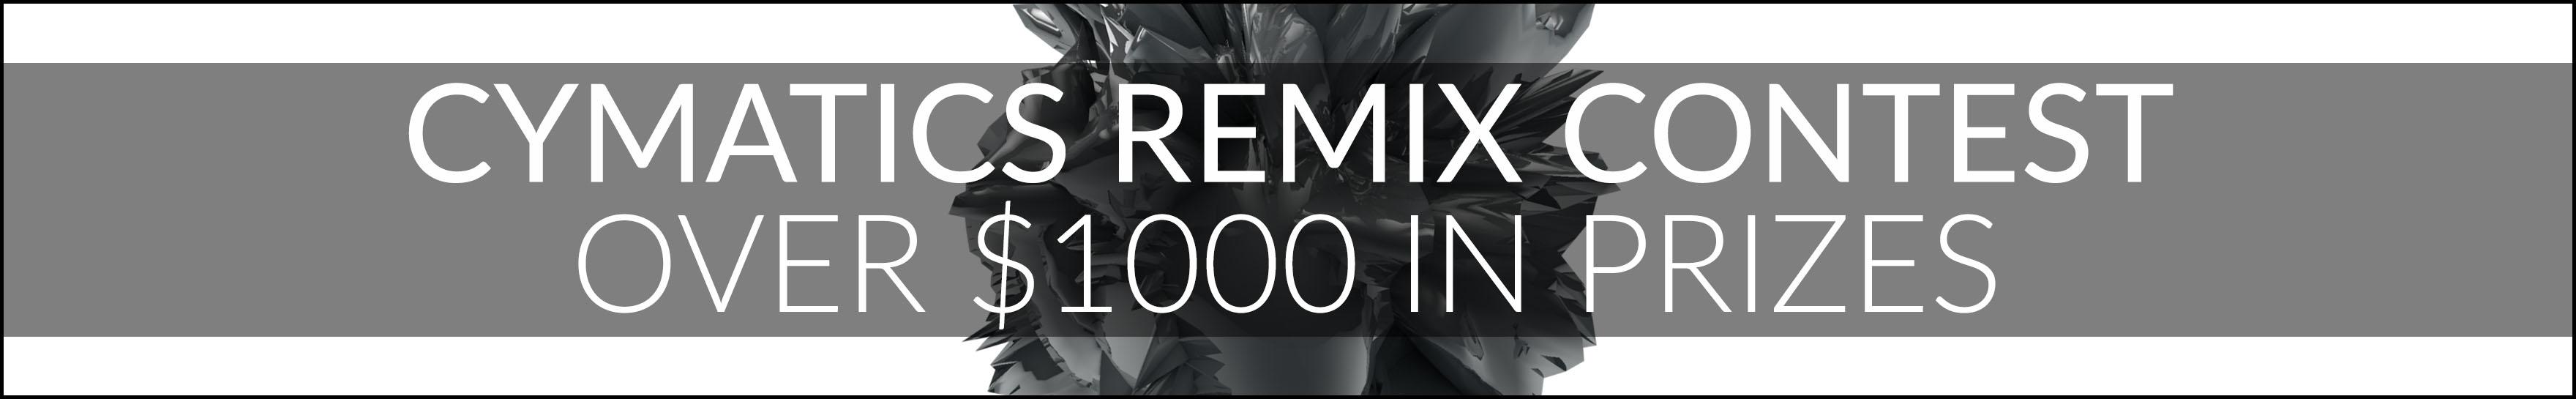 Cymatics Remix Contest